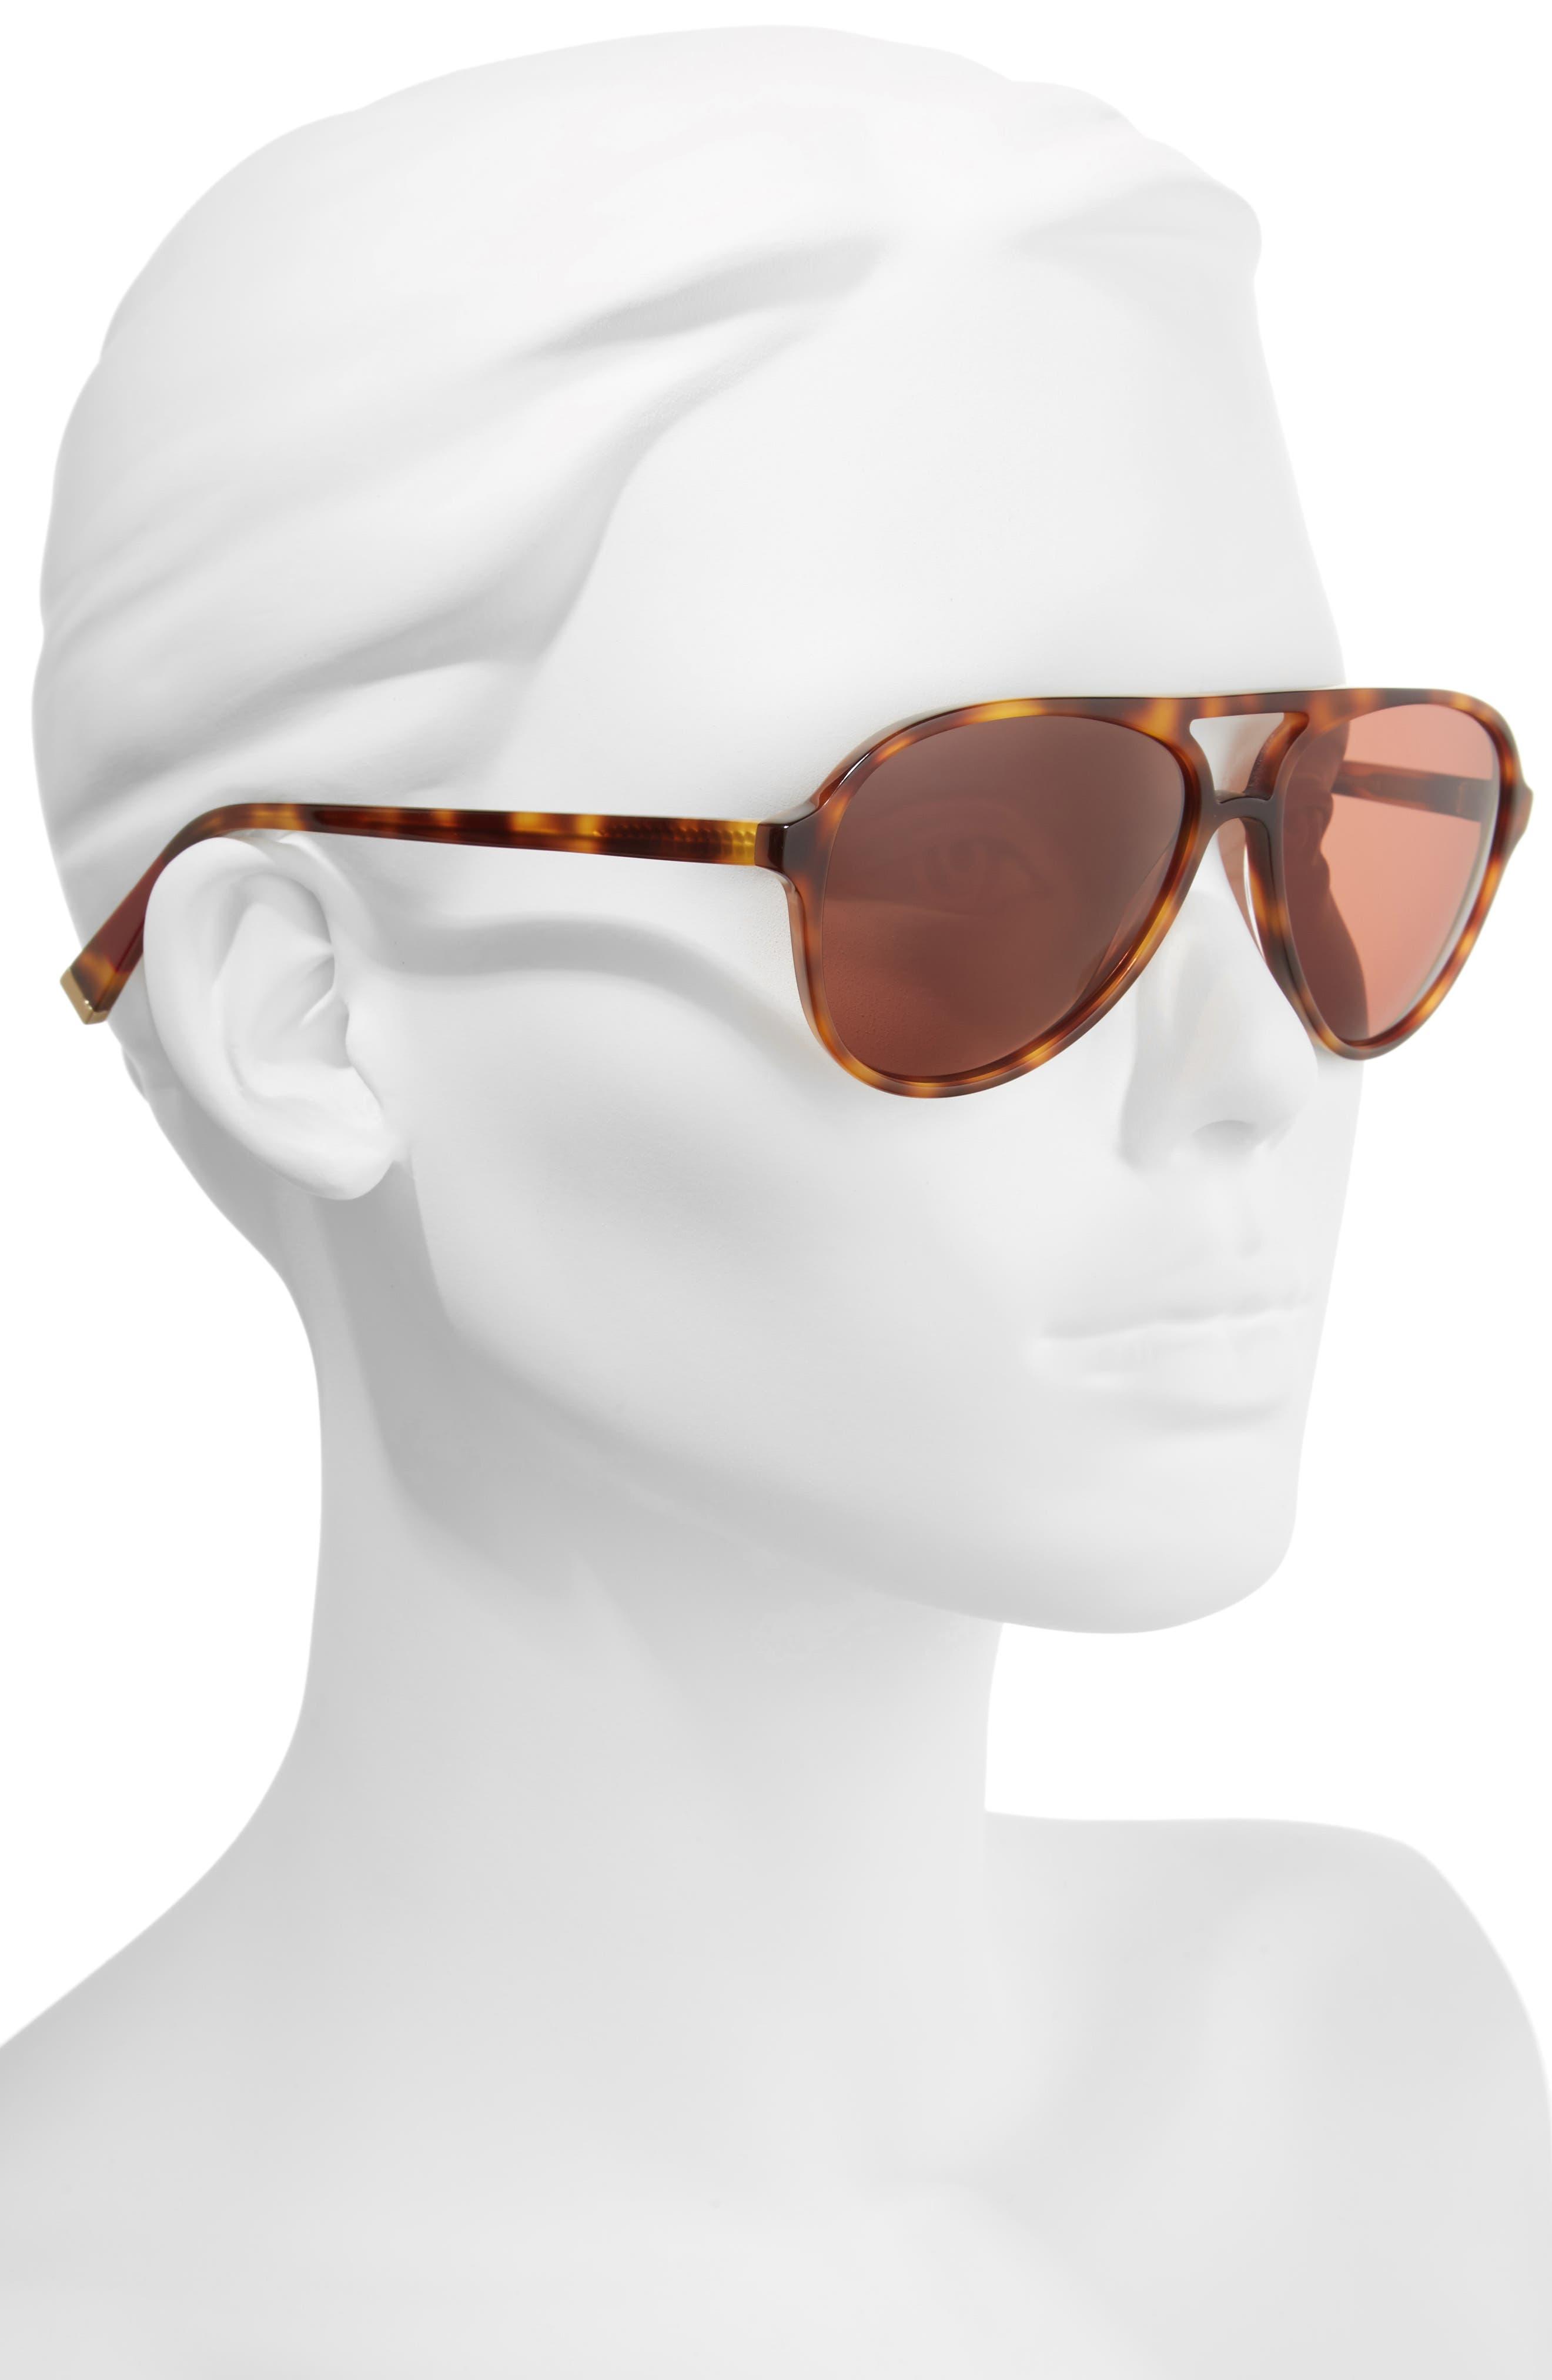 58mm Gradient Aviator Sunglasses,                             Alternate thumbnail 2, color,                             TORTOISE